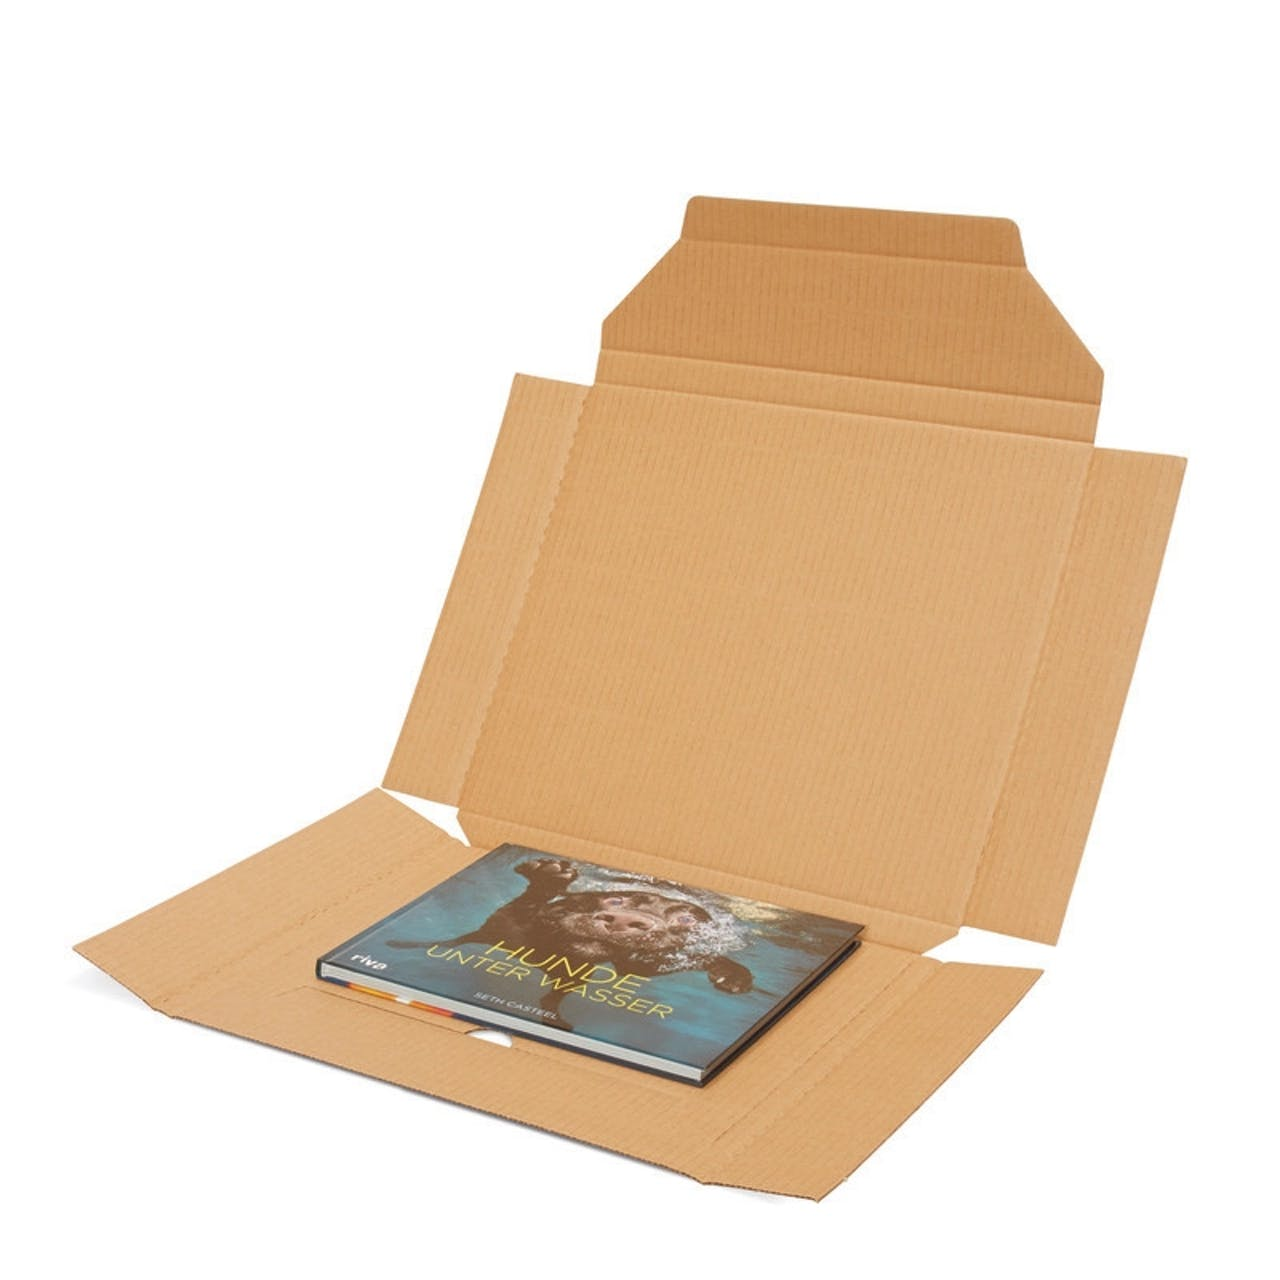 Flach-/Kalender-Pack, VAR: 735w